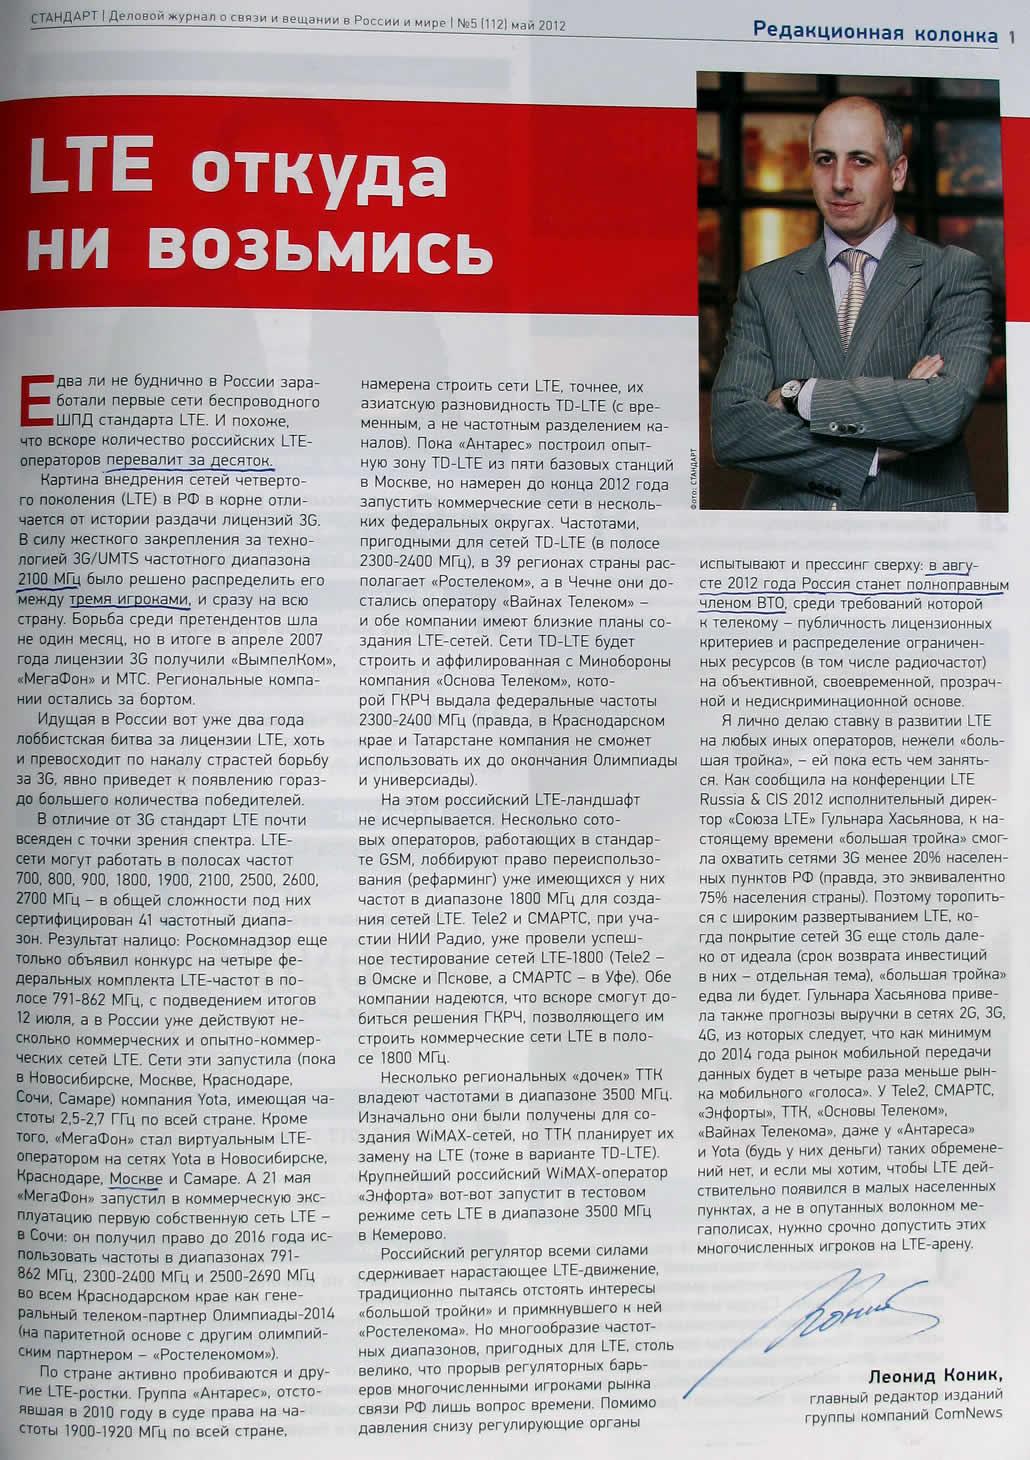 LTE/WiMAX в MSK/SPB и др. городах-lte-01.jpg